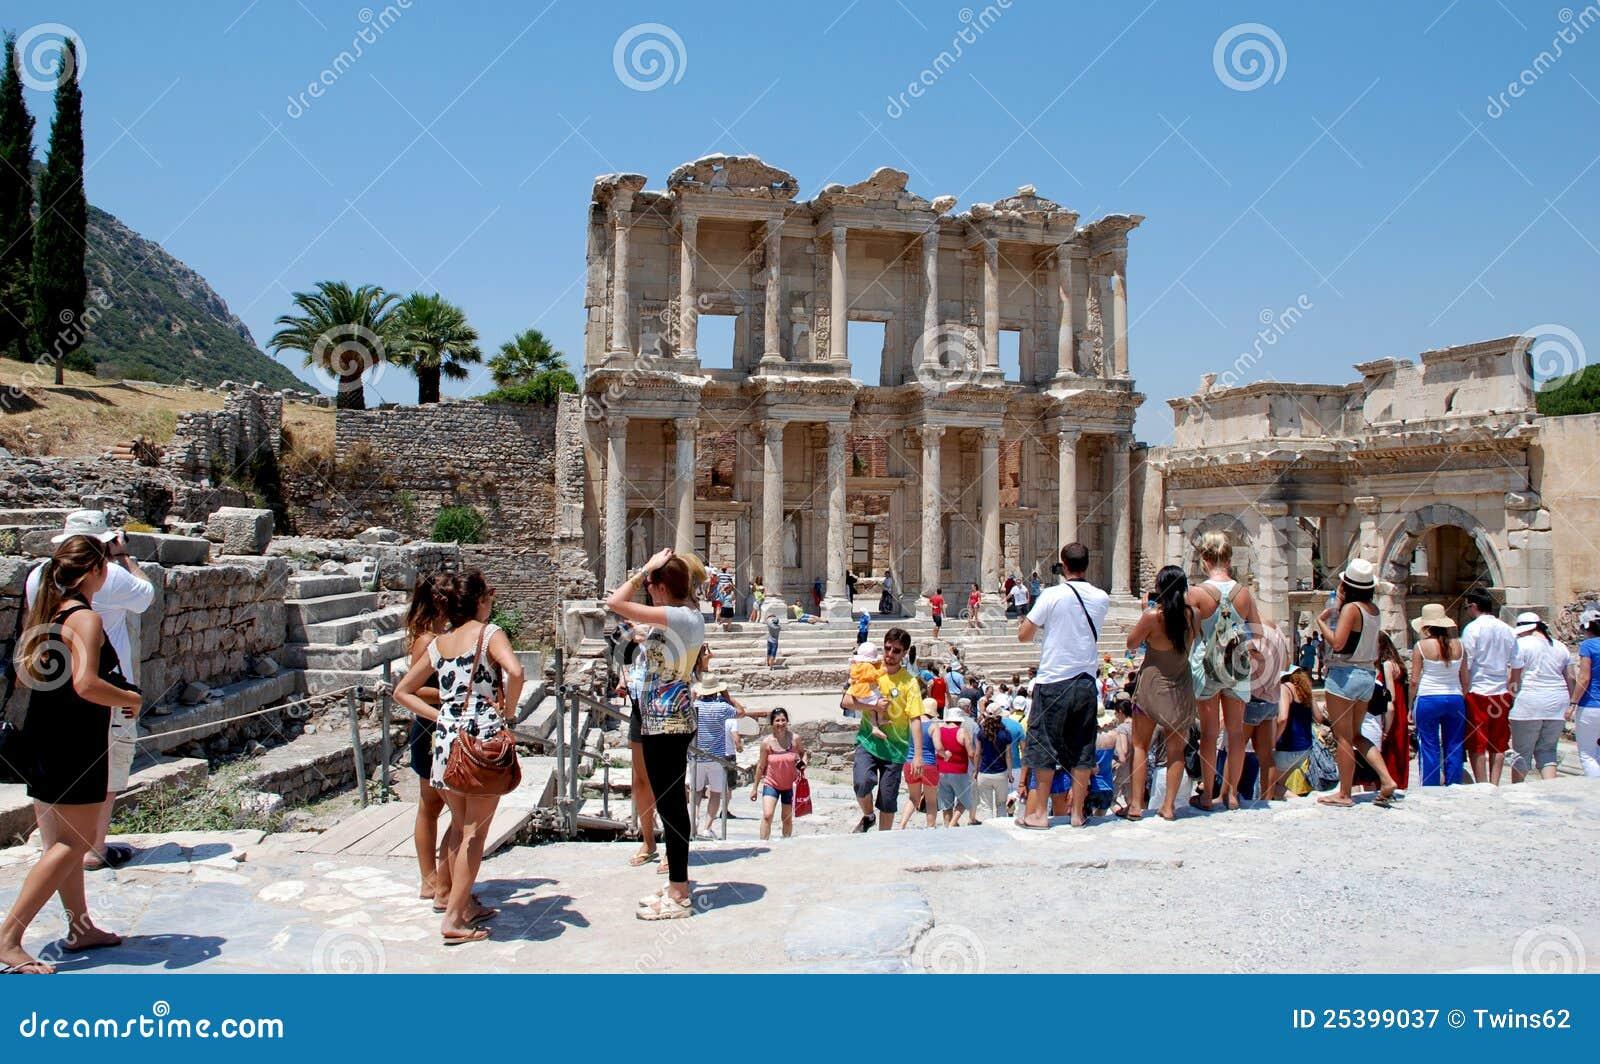 Tourist Attraction In Izmir Turkey Turkey izmir aliaga tripinview